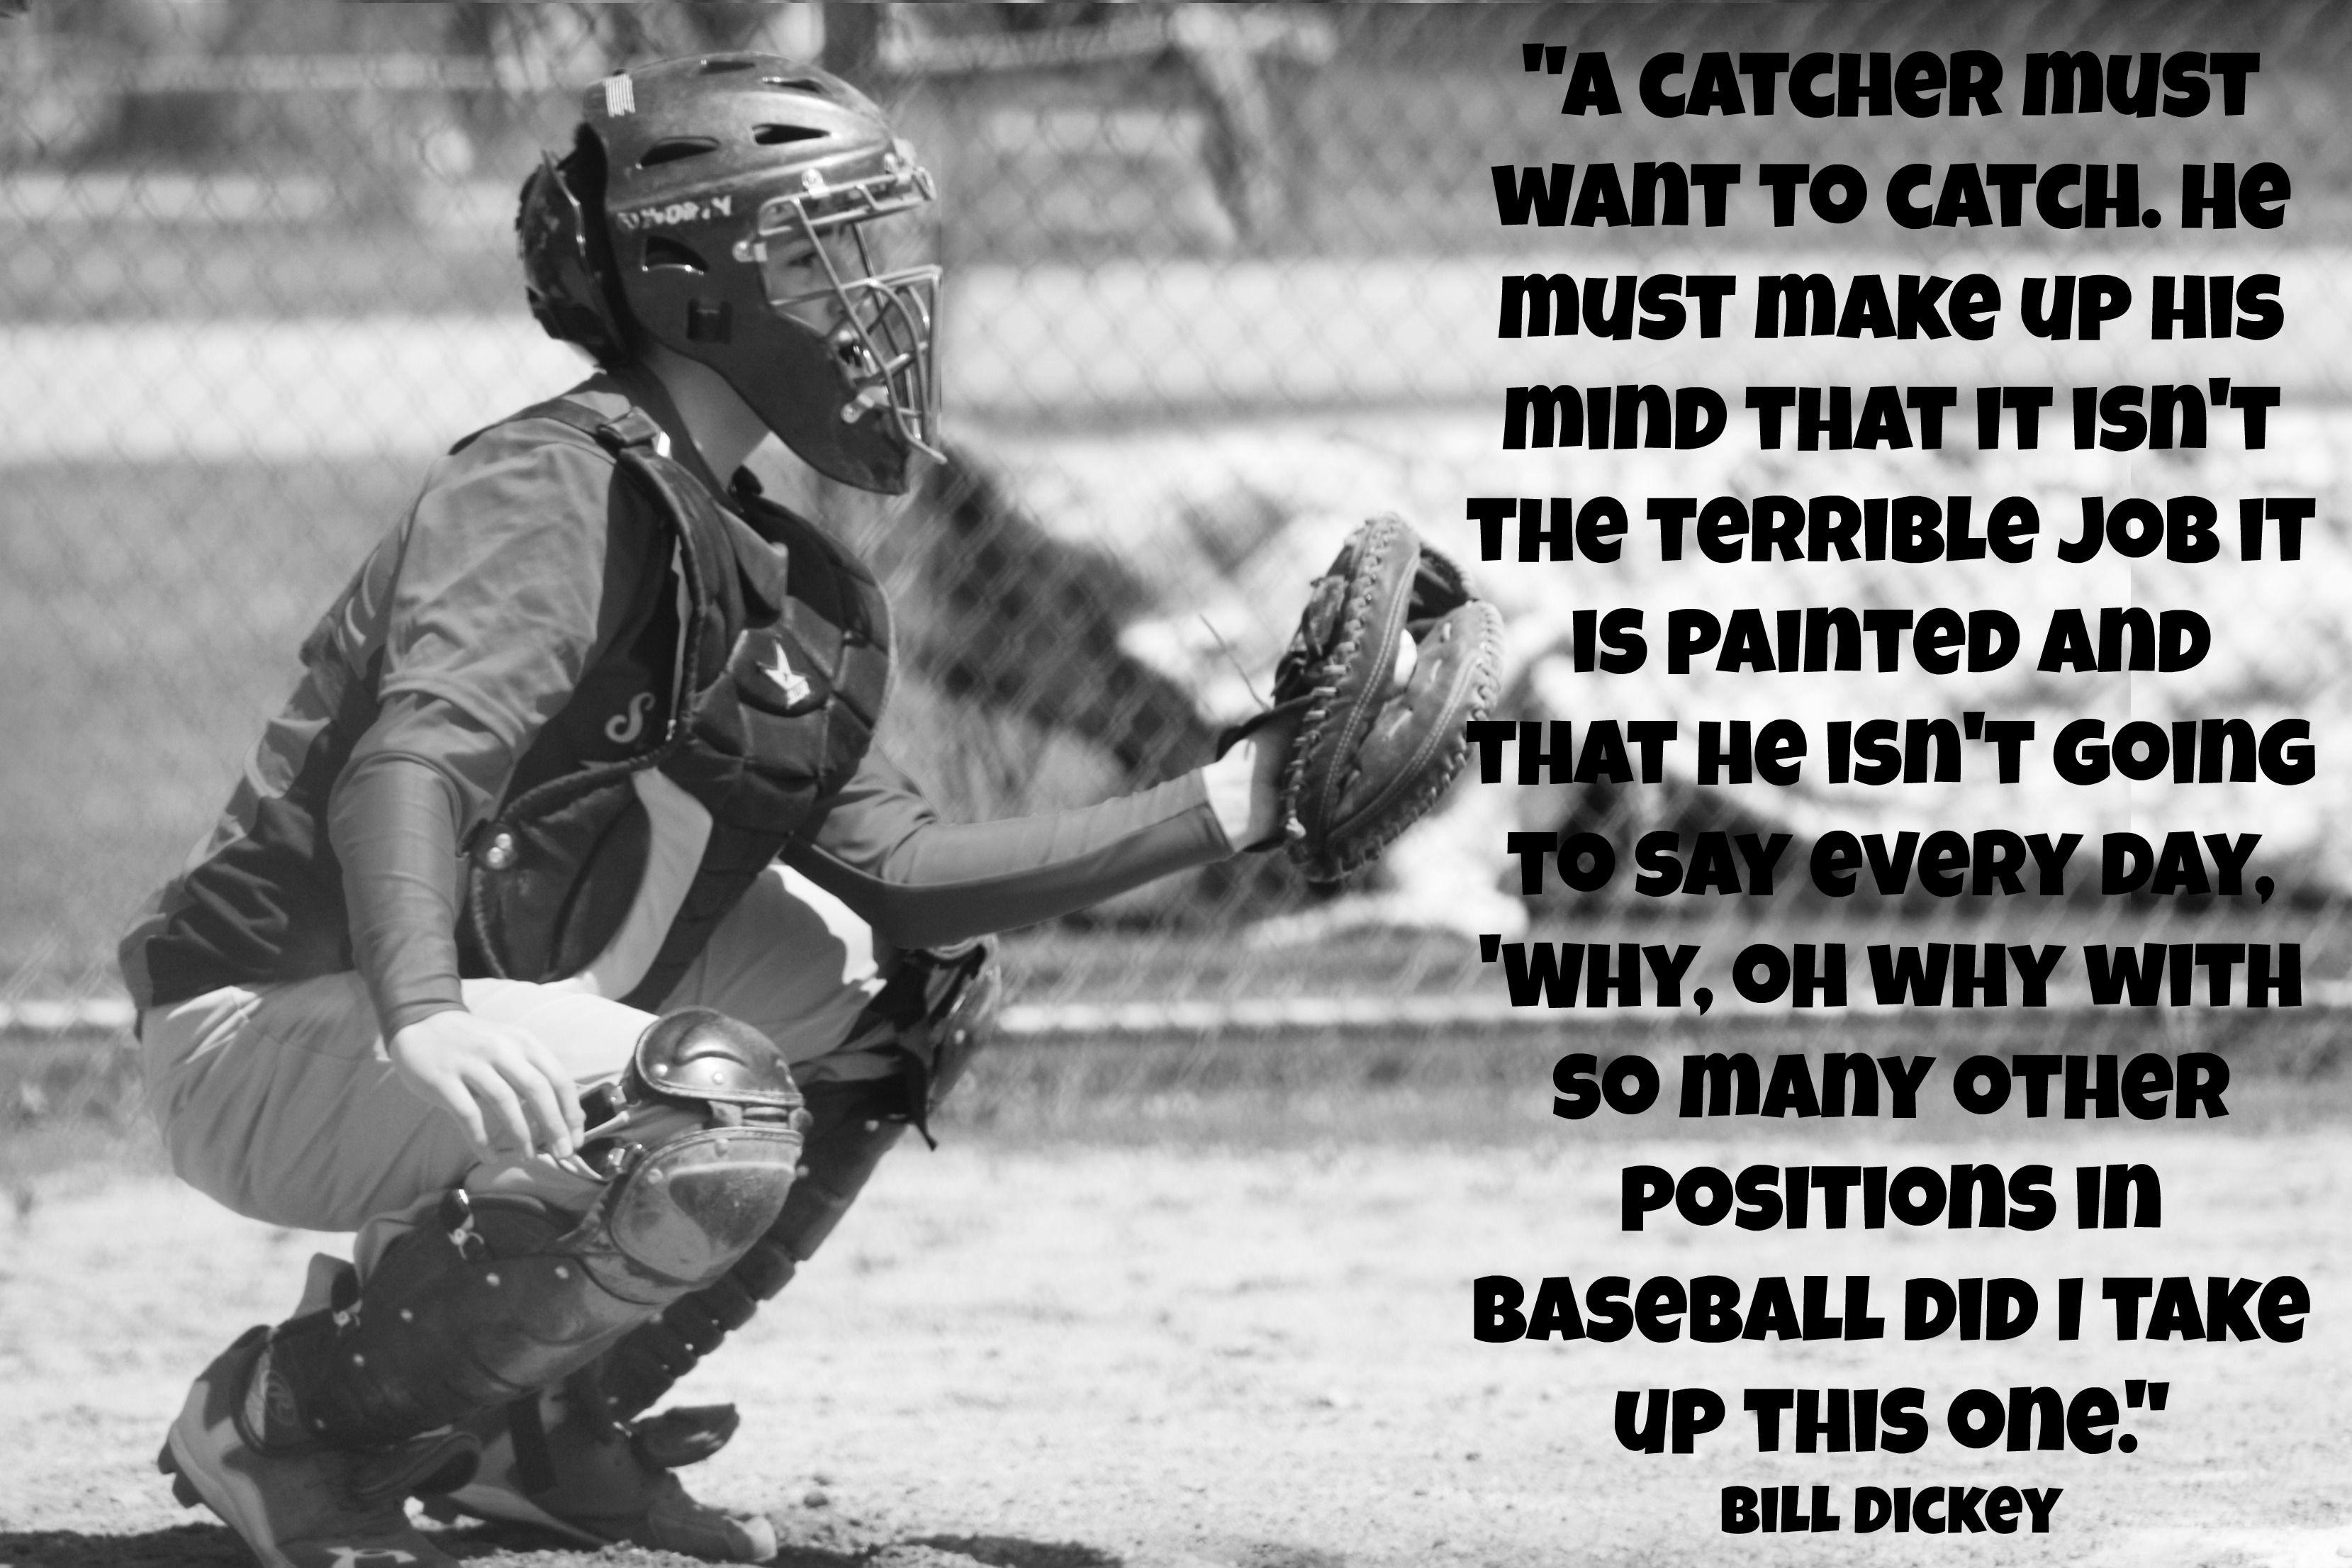 Baseball Catcher Quotes Baseball Motivational Quotes Catcher Quotes Baseball Catcher